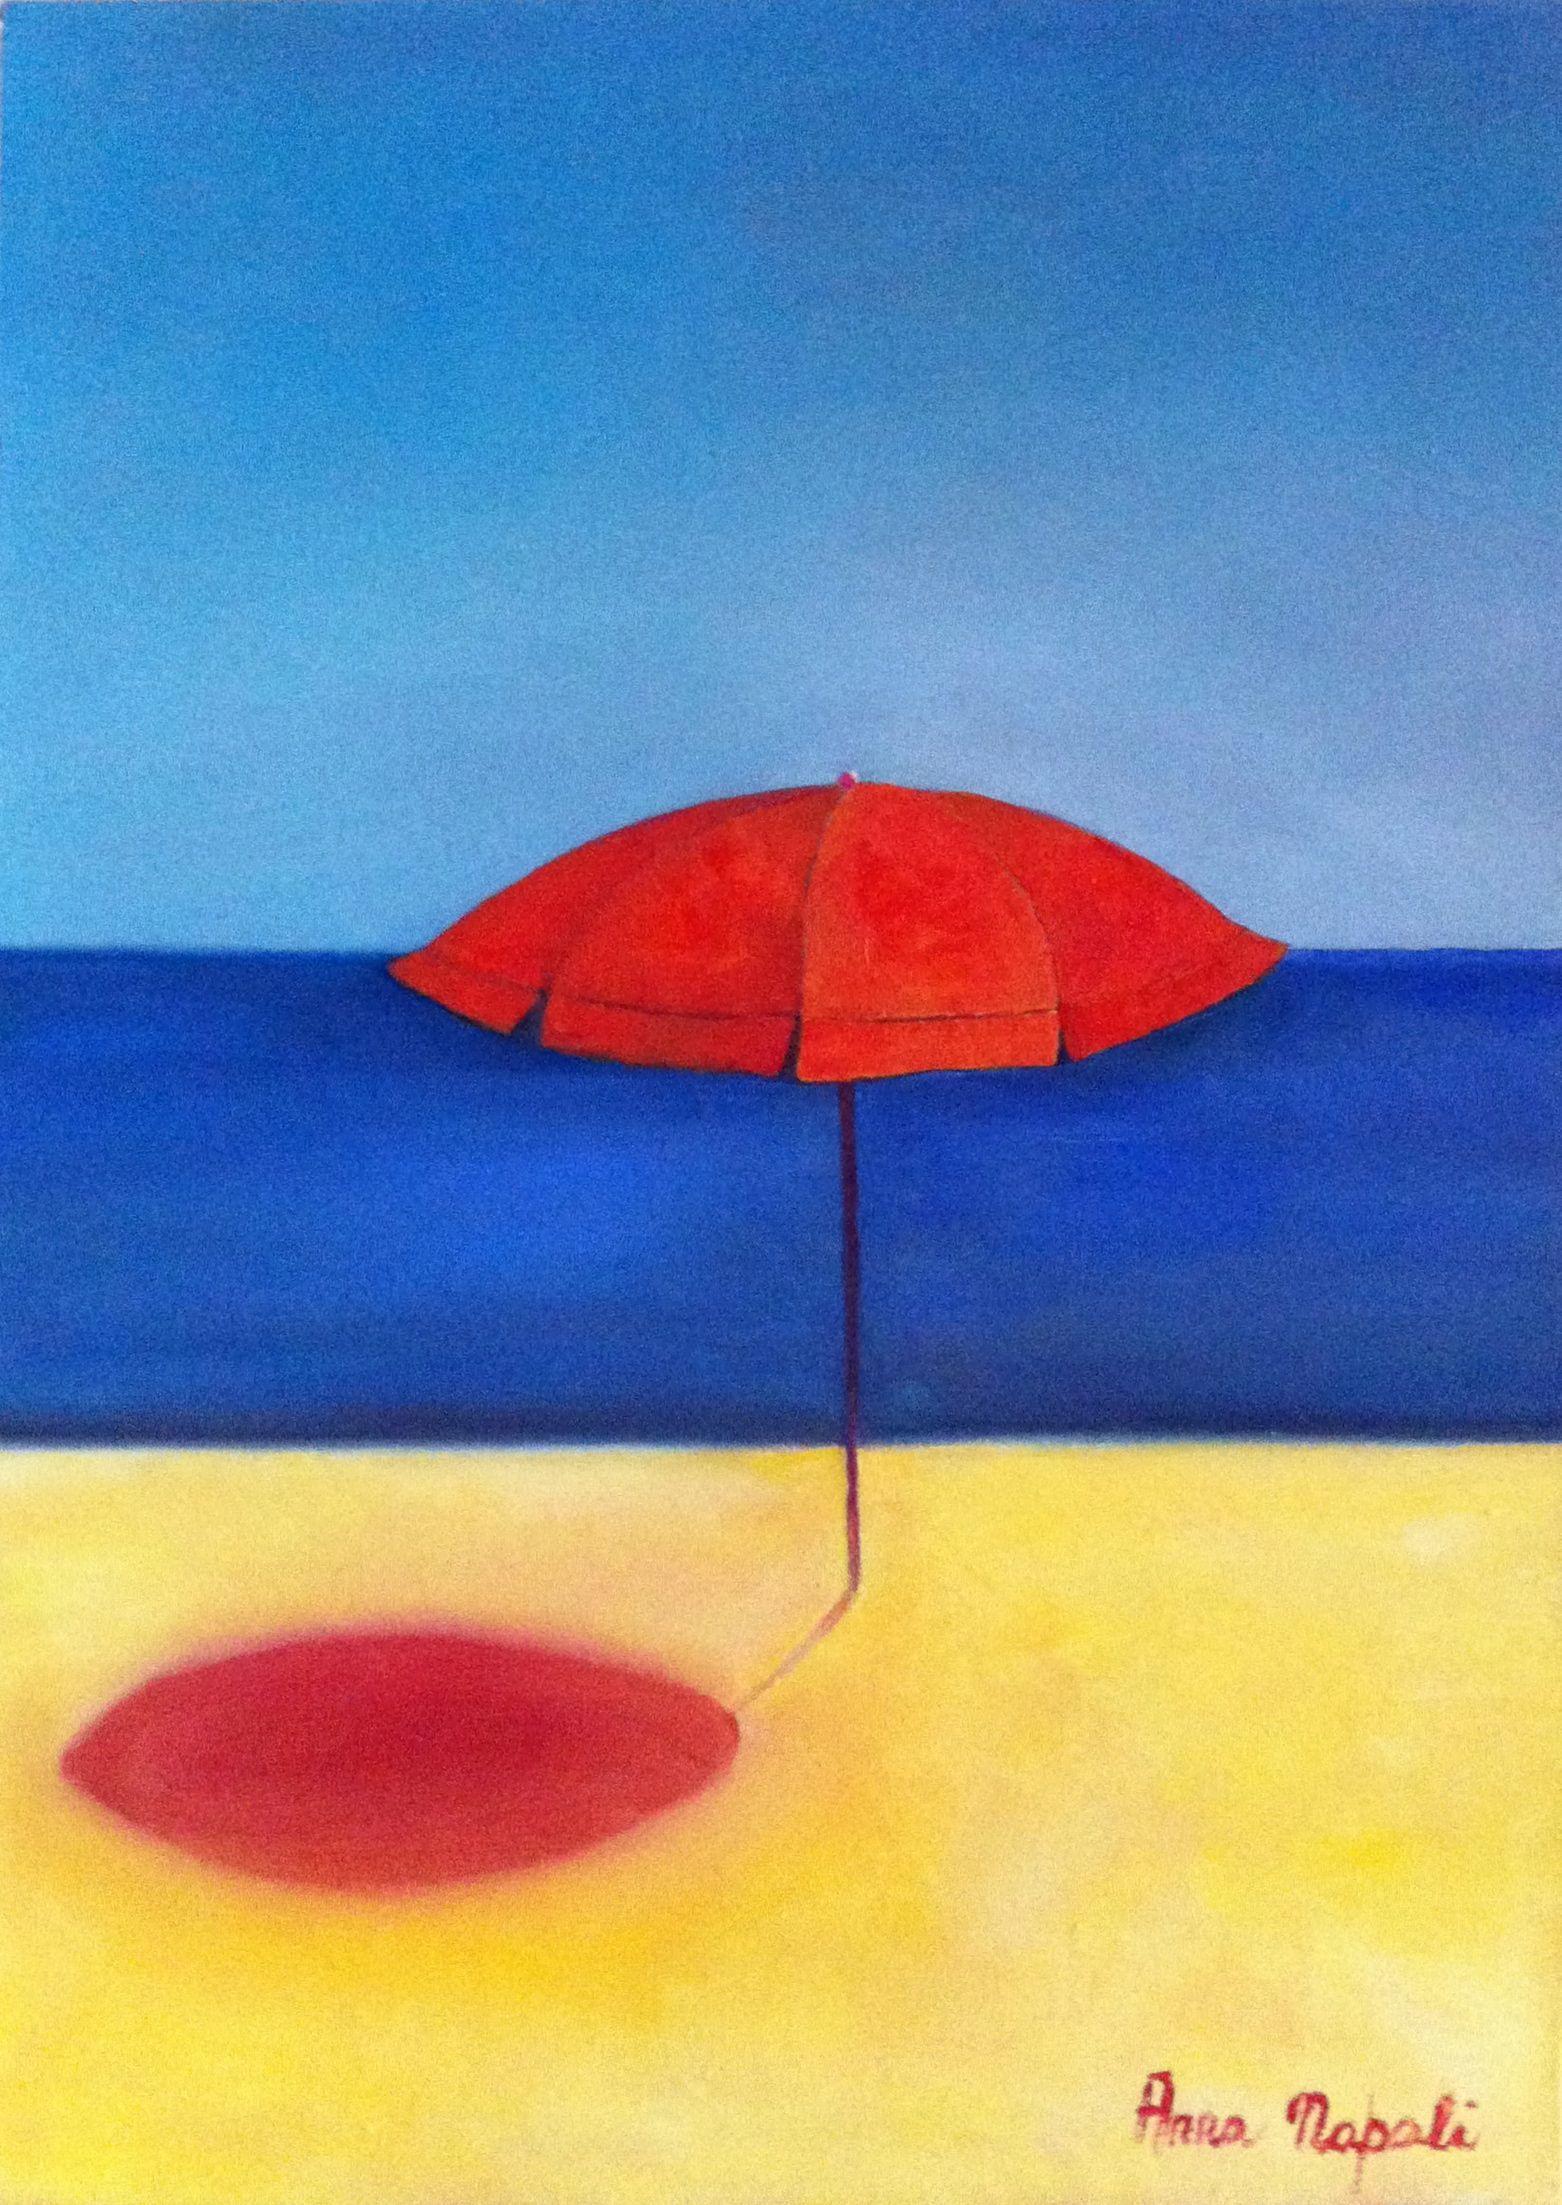 One Red Sun Umbrella